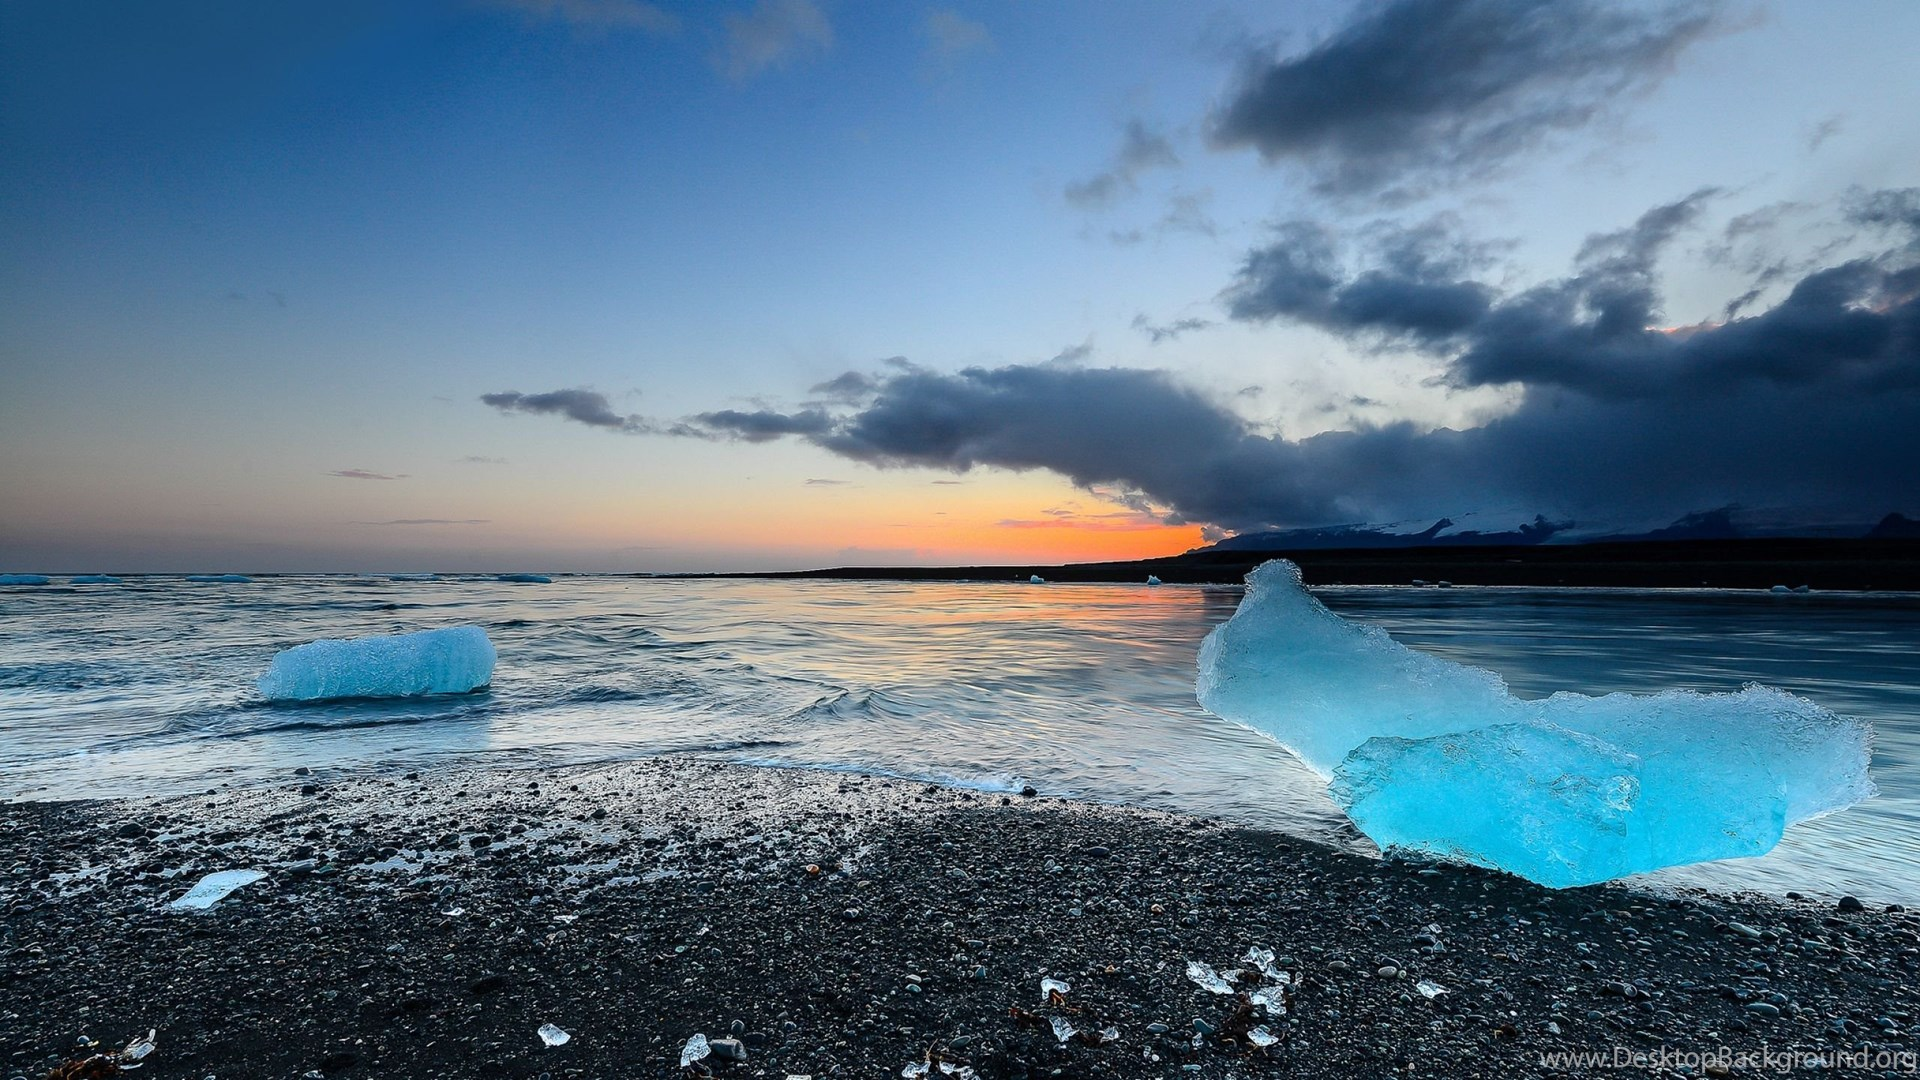 Mac imac 27 iceland wallpapers hd desktop backgrounds - Iceland iphone wallpaper ...